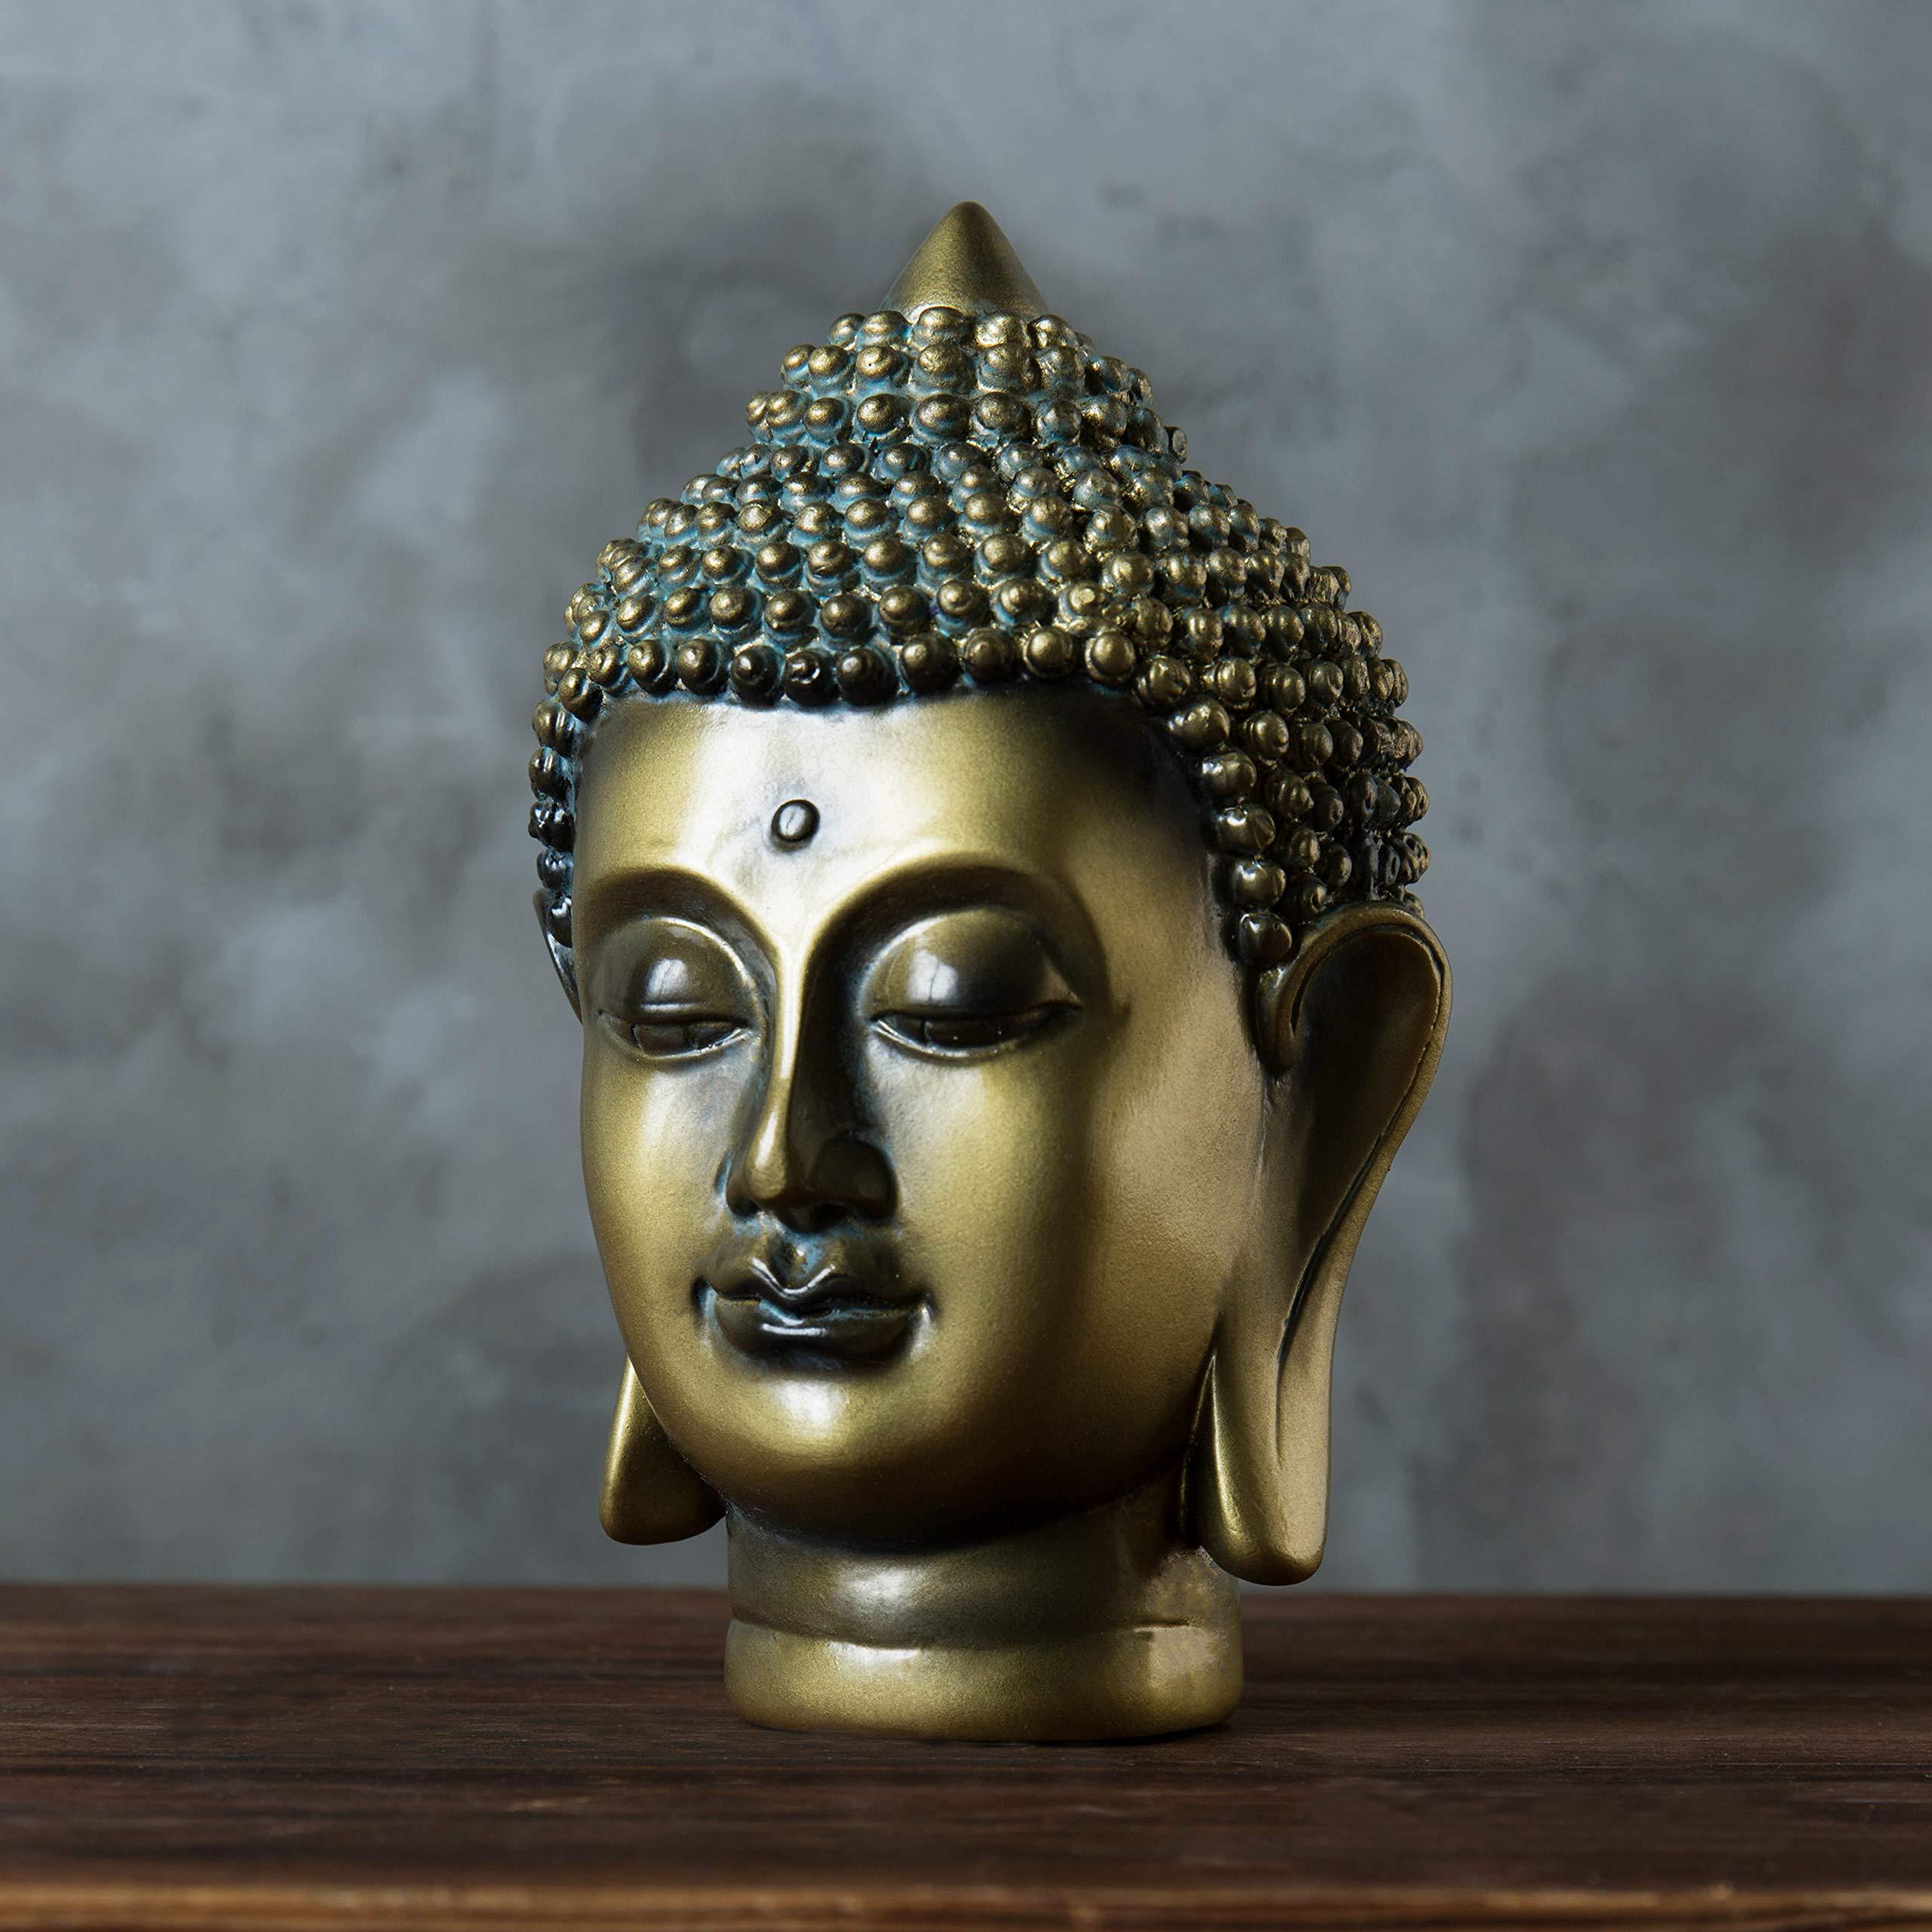 MyGift 6-Inch Gold-Tone Resin Meditating Buddha Head Statuette by MyGift